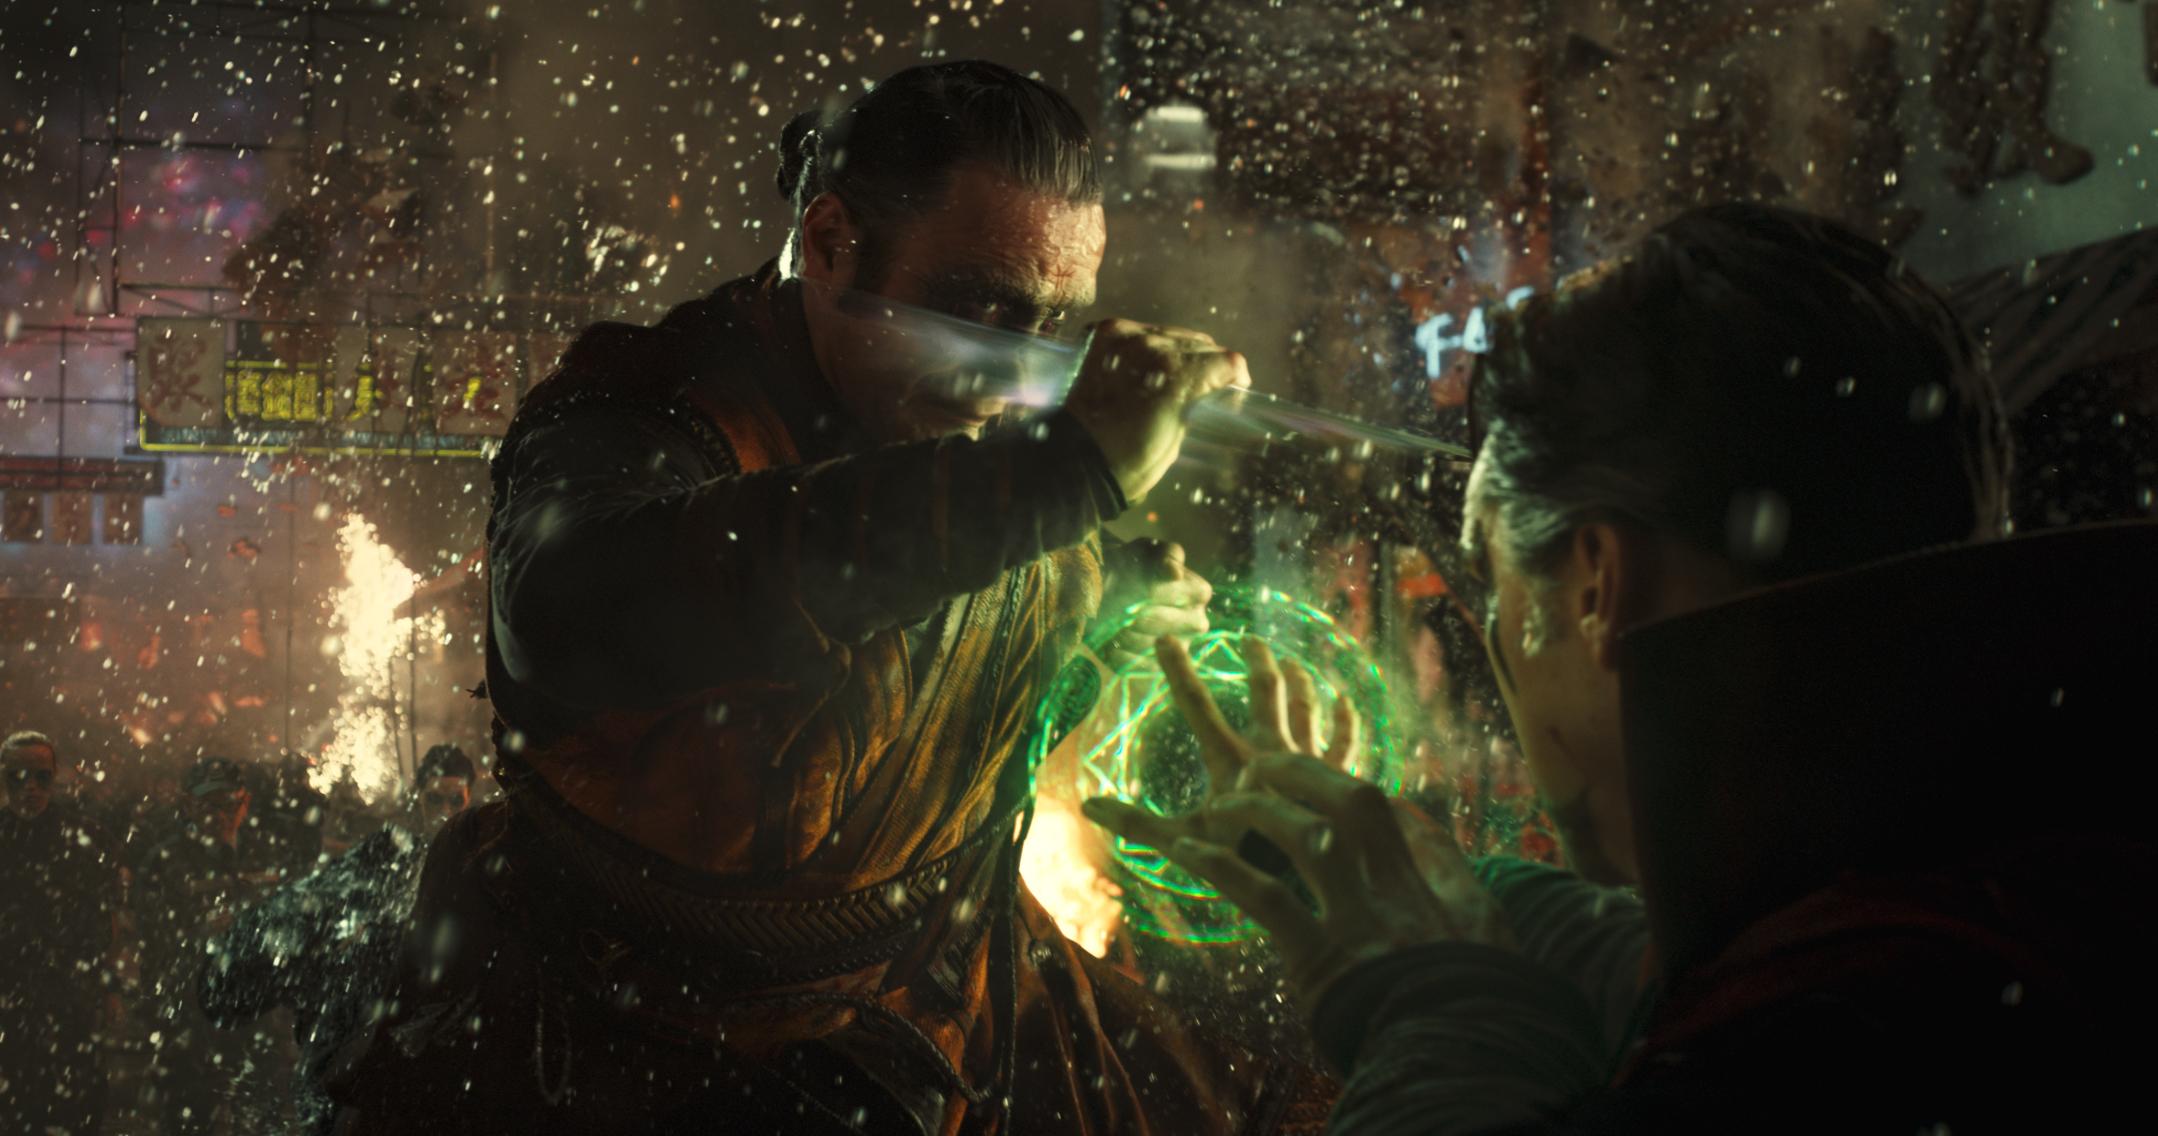 Mads Mikkelsen being cool as always as Kaecilius in Doctor Strange